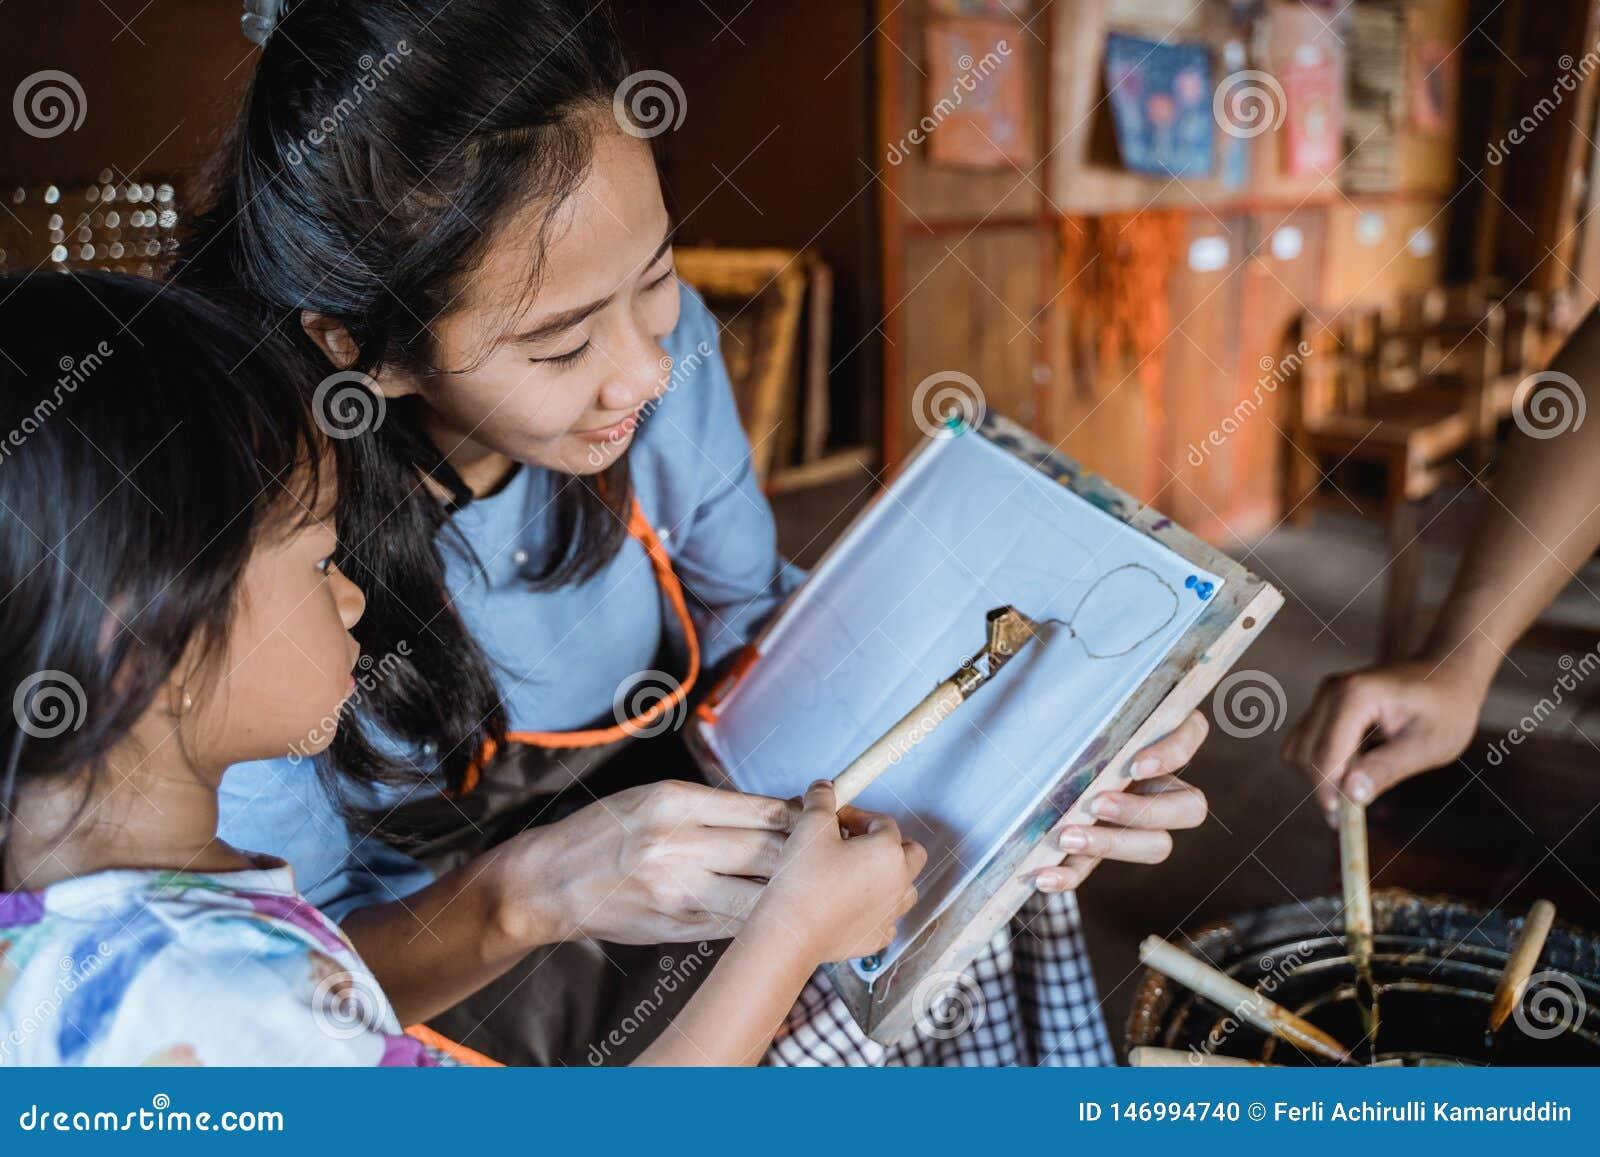 Mother and child asian making batik pattern